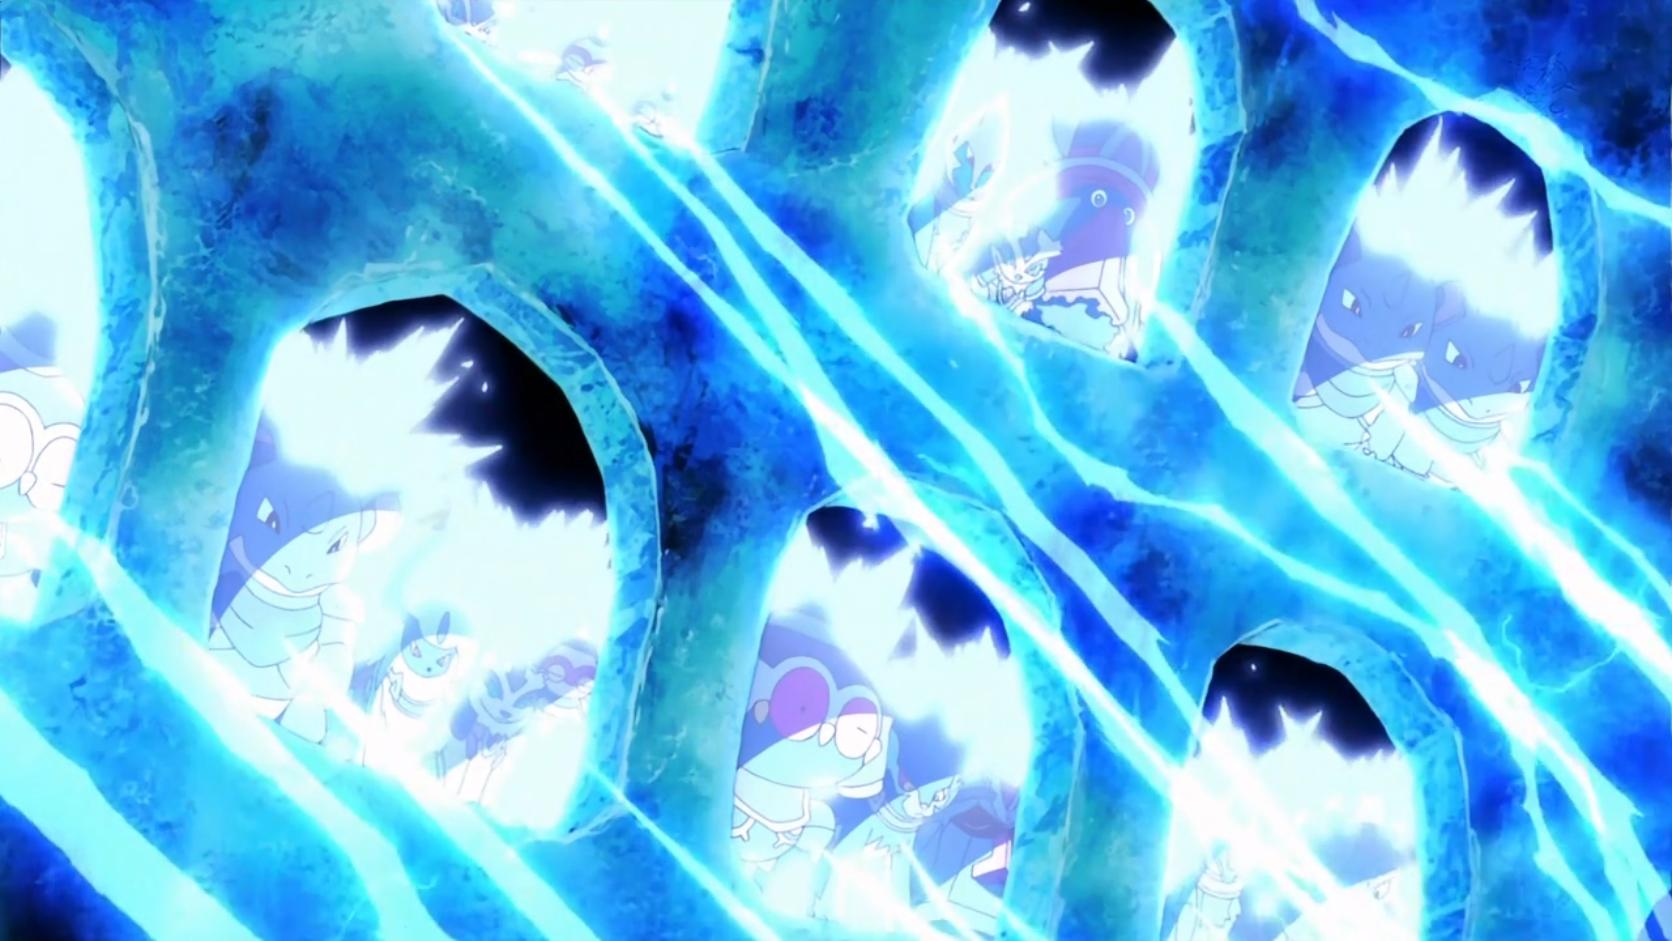 Poliwag (Pokémon) - Bulbapedia, the community-driven ...